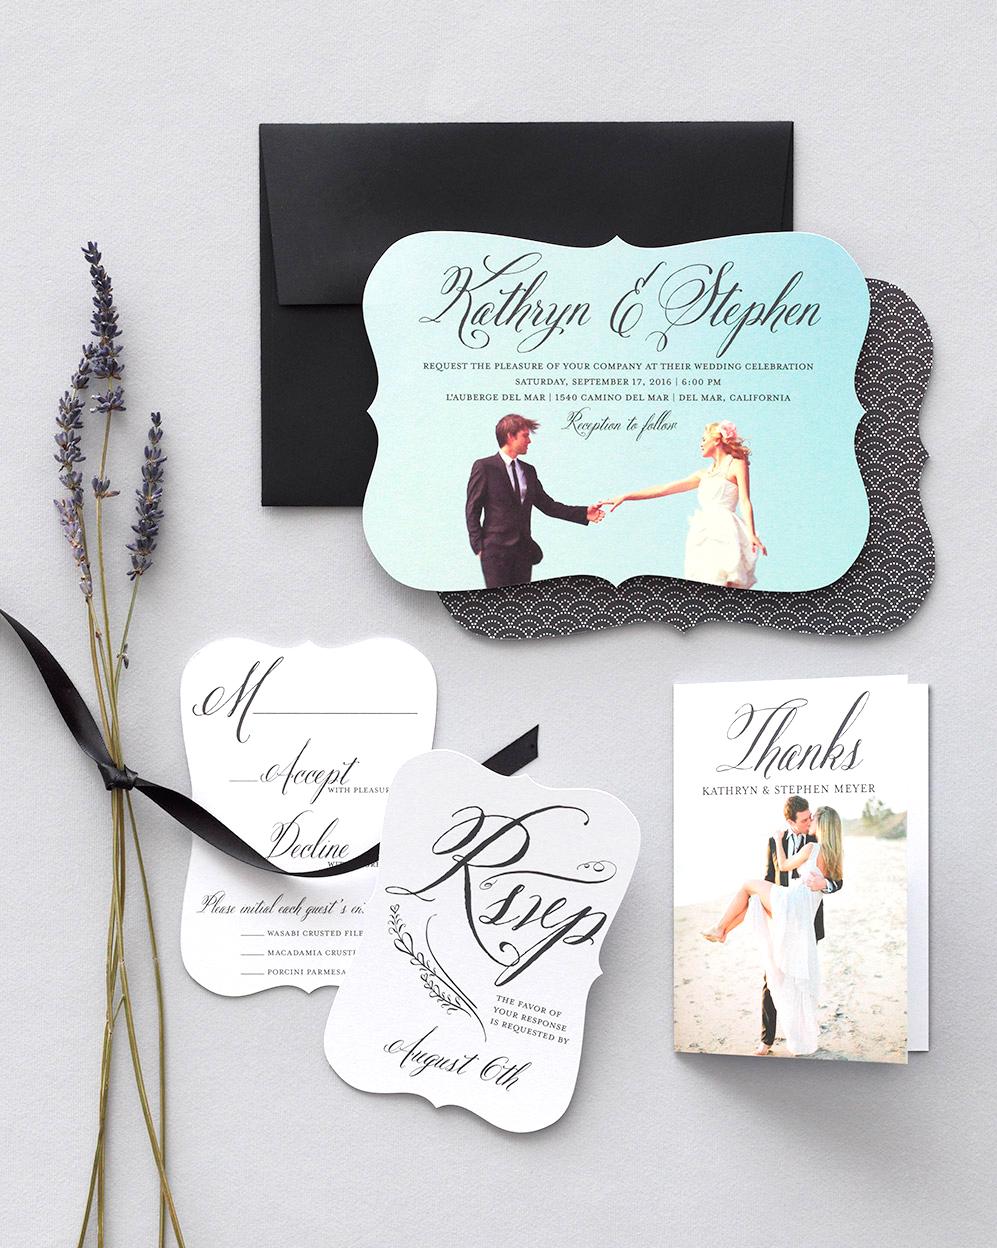 wedding-paper-divas-wedding-invitations-1135354-suite-0914.jpg